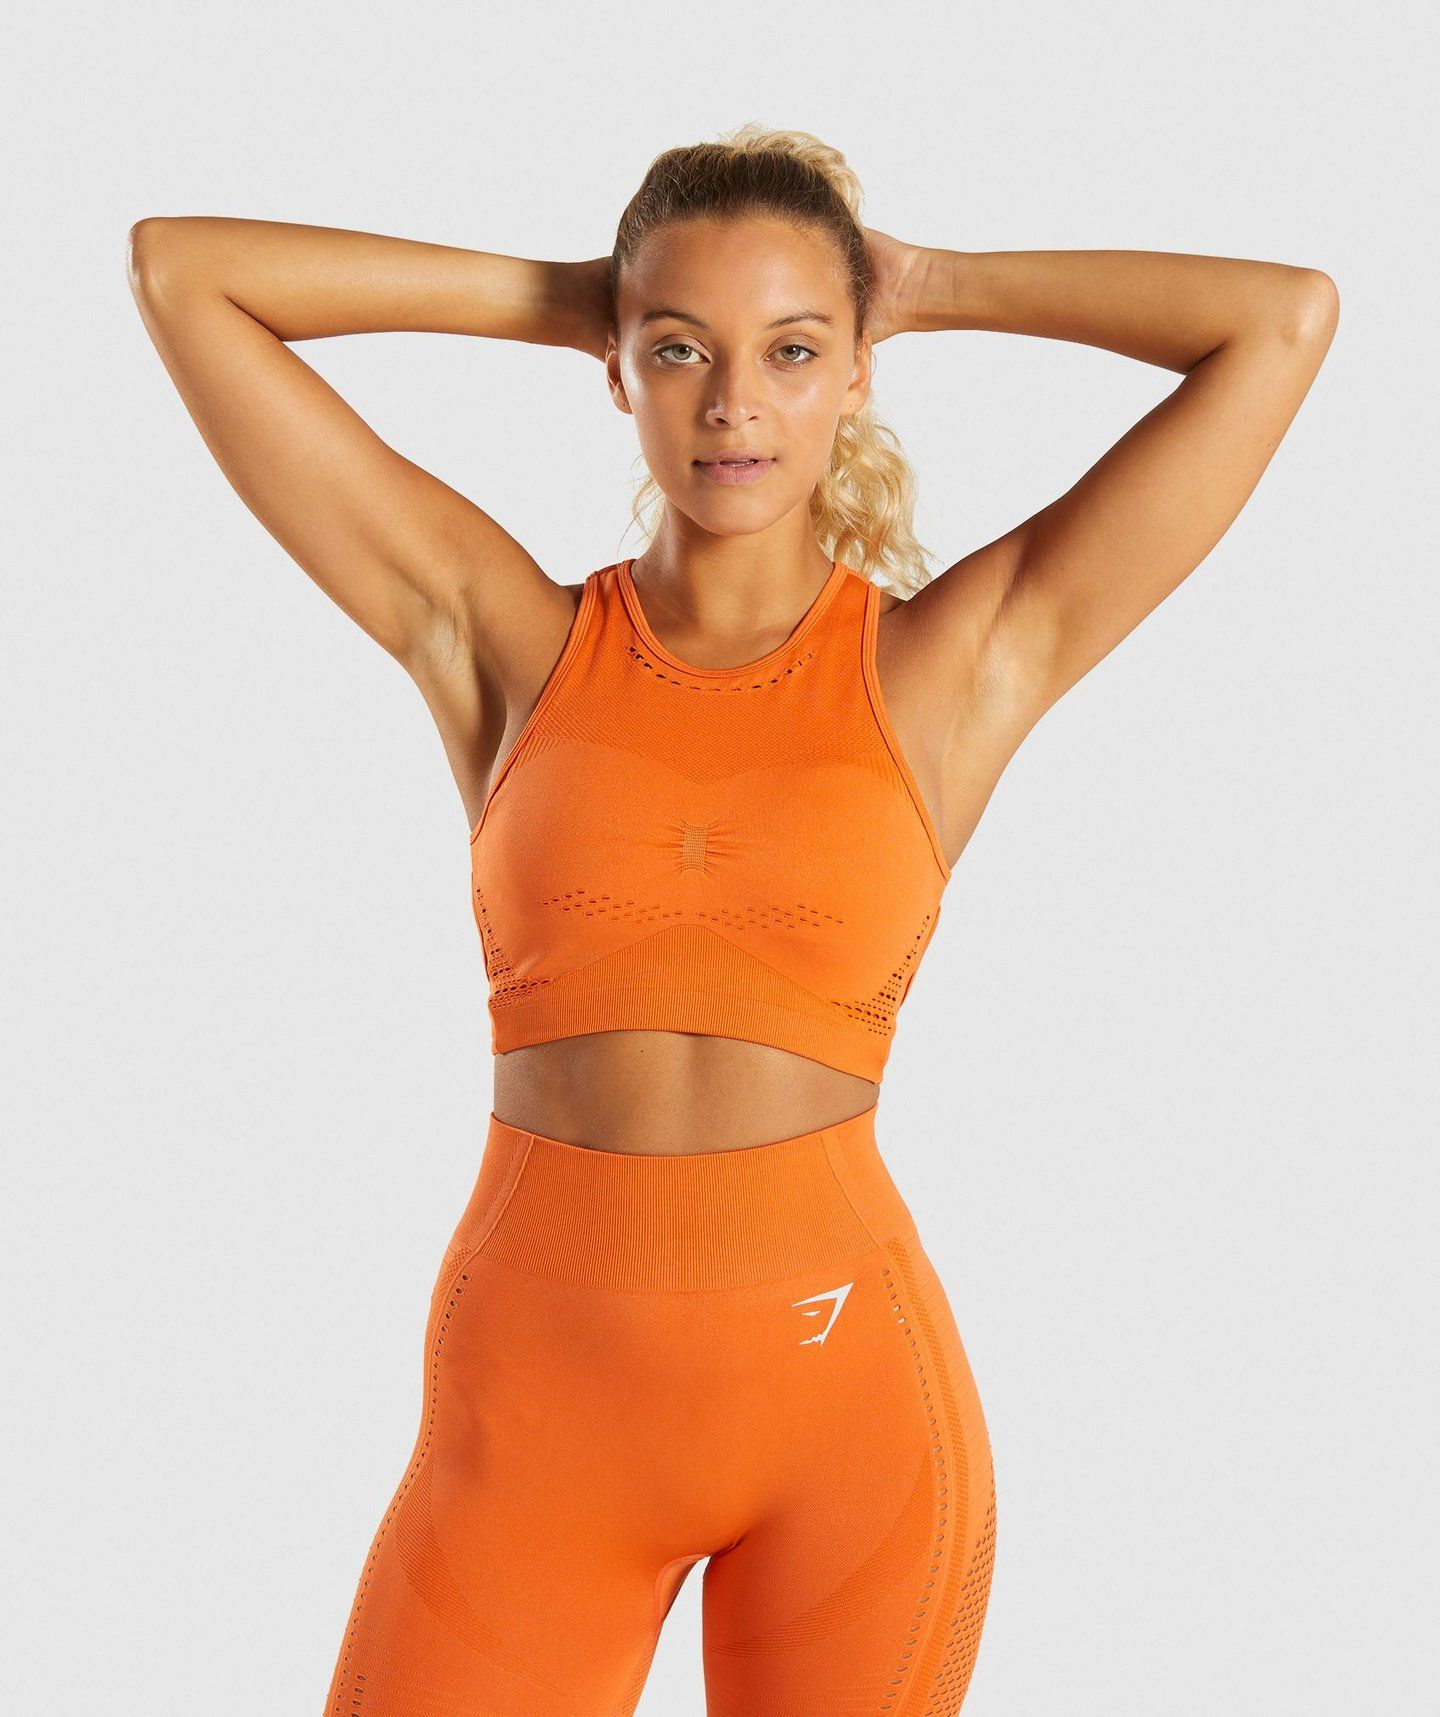 e5a6ac826494e Gymshark Flawless Knit Sports Bra - Burnt Orange - Small in 2019 ...